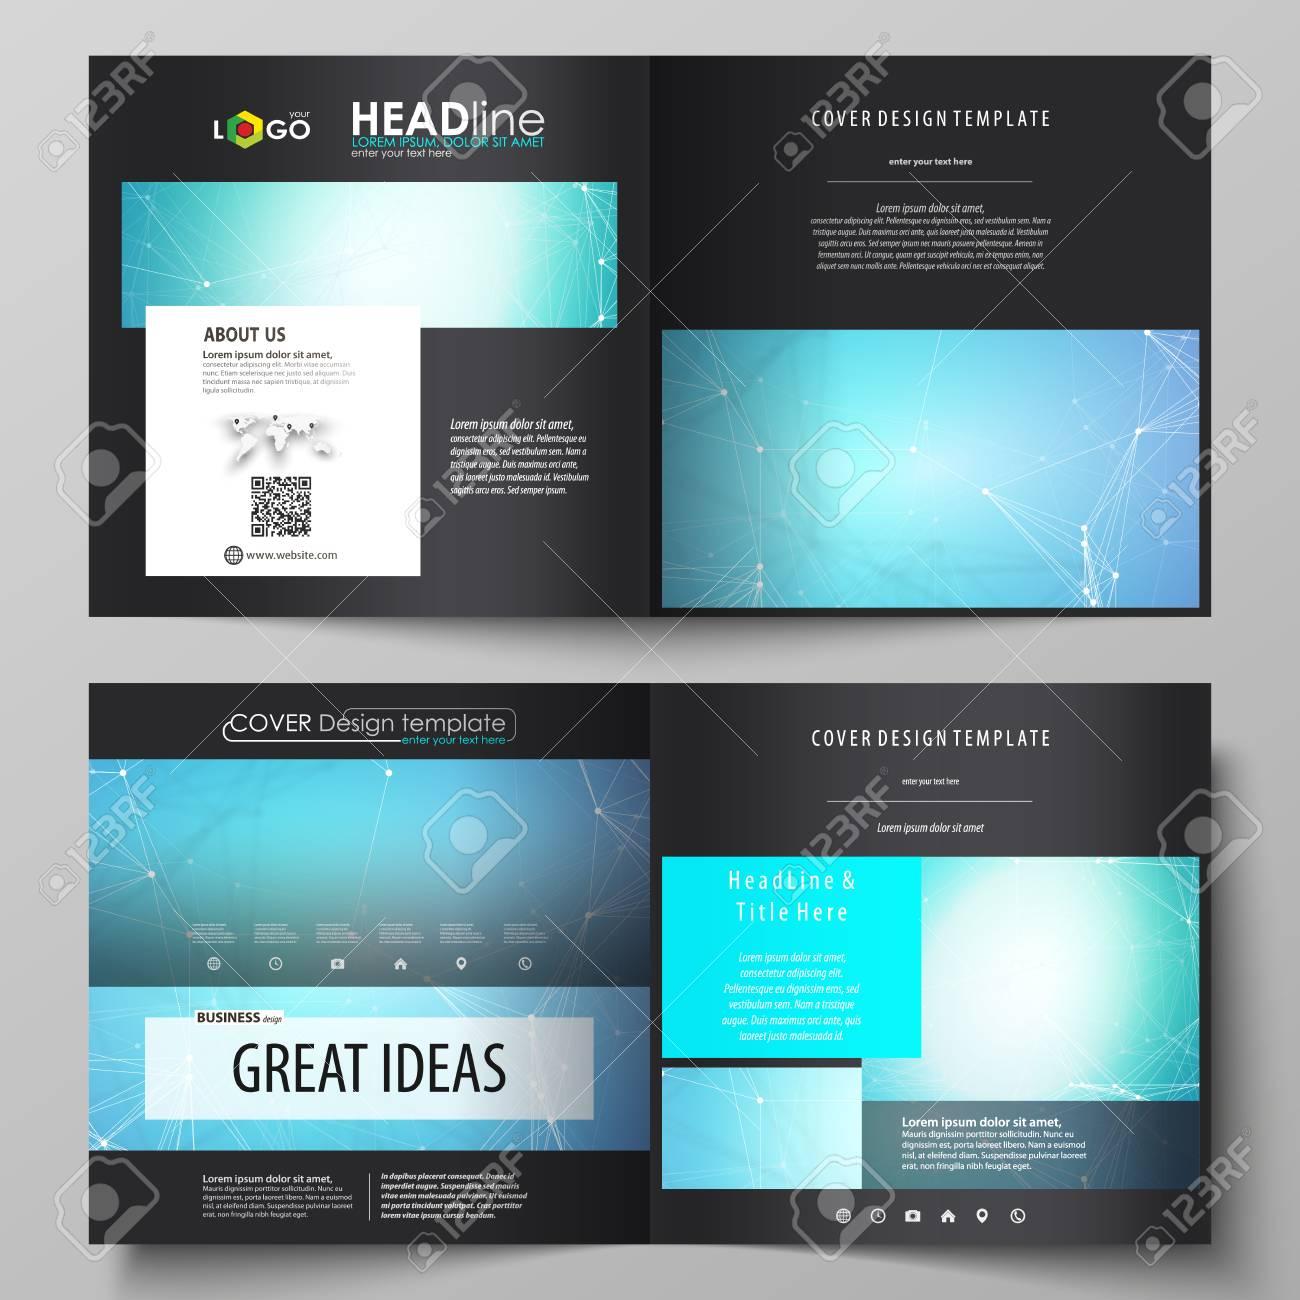 Business Templates For Square Design Bi Fold Brochure Flyer Leaflet Cover Vector Layout